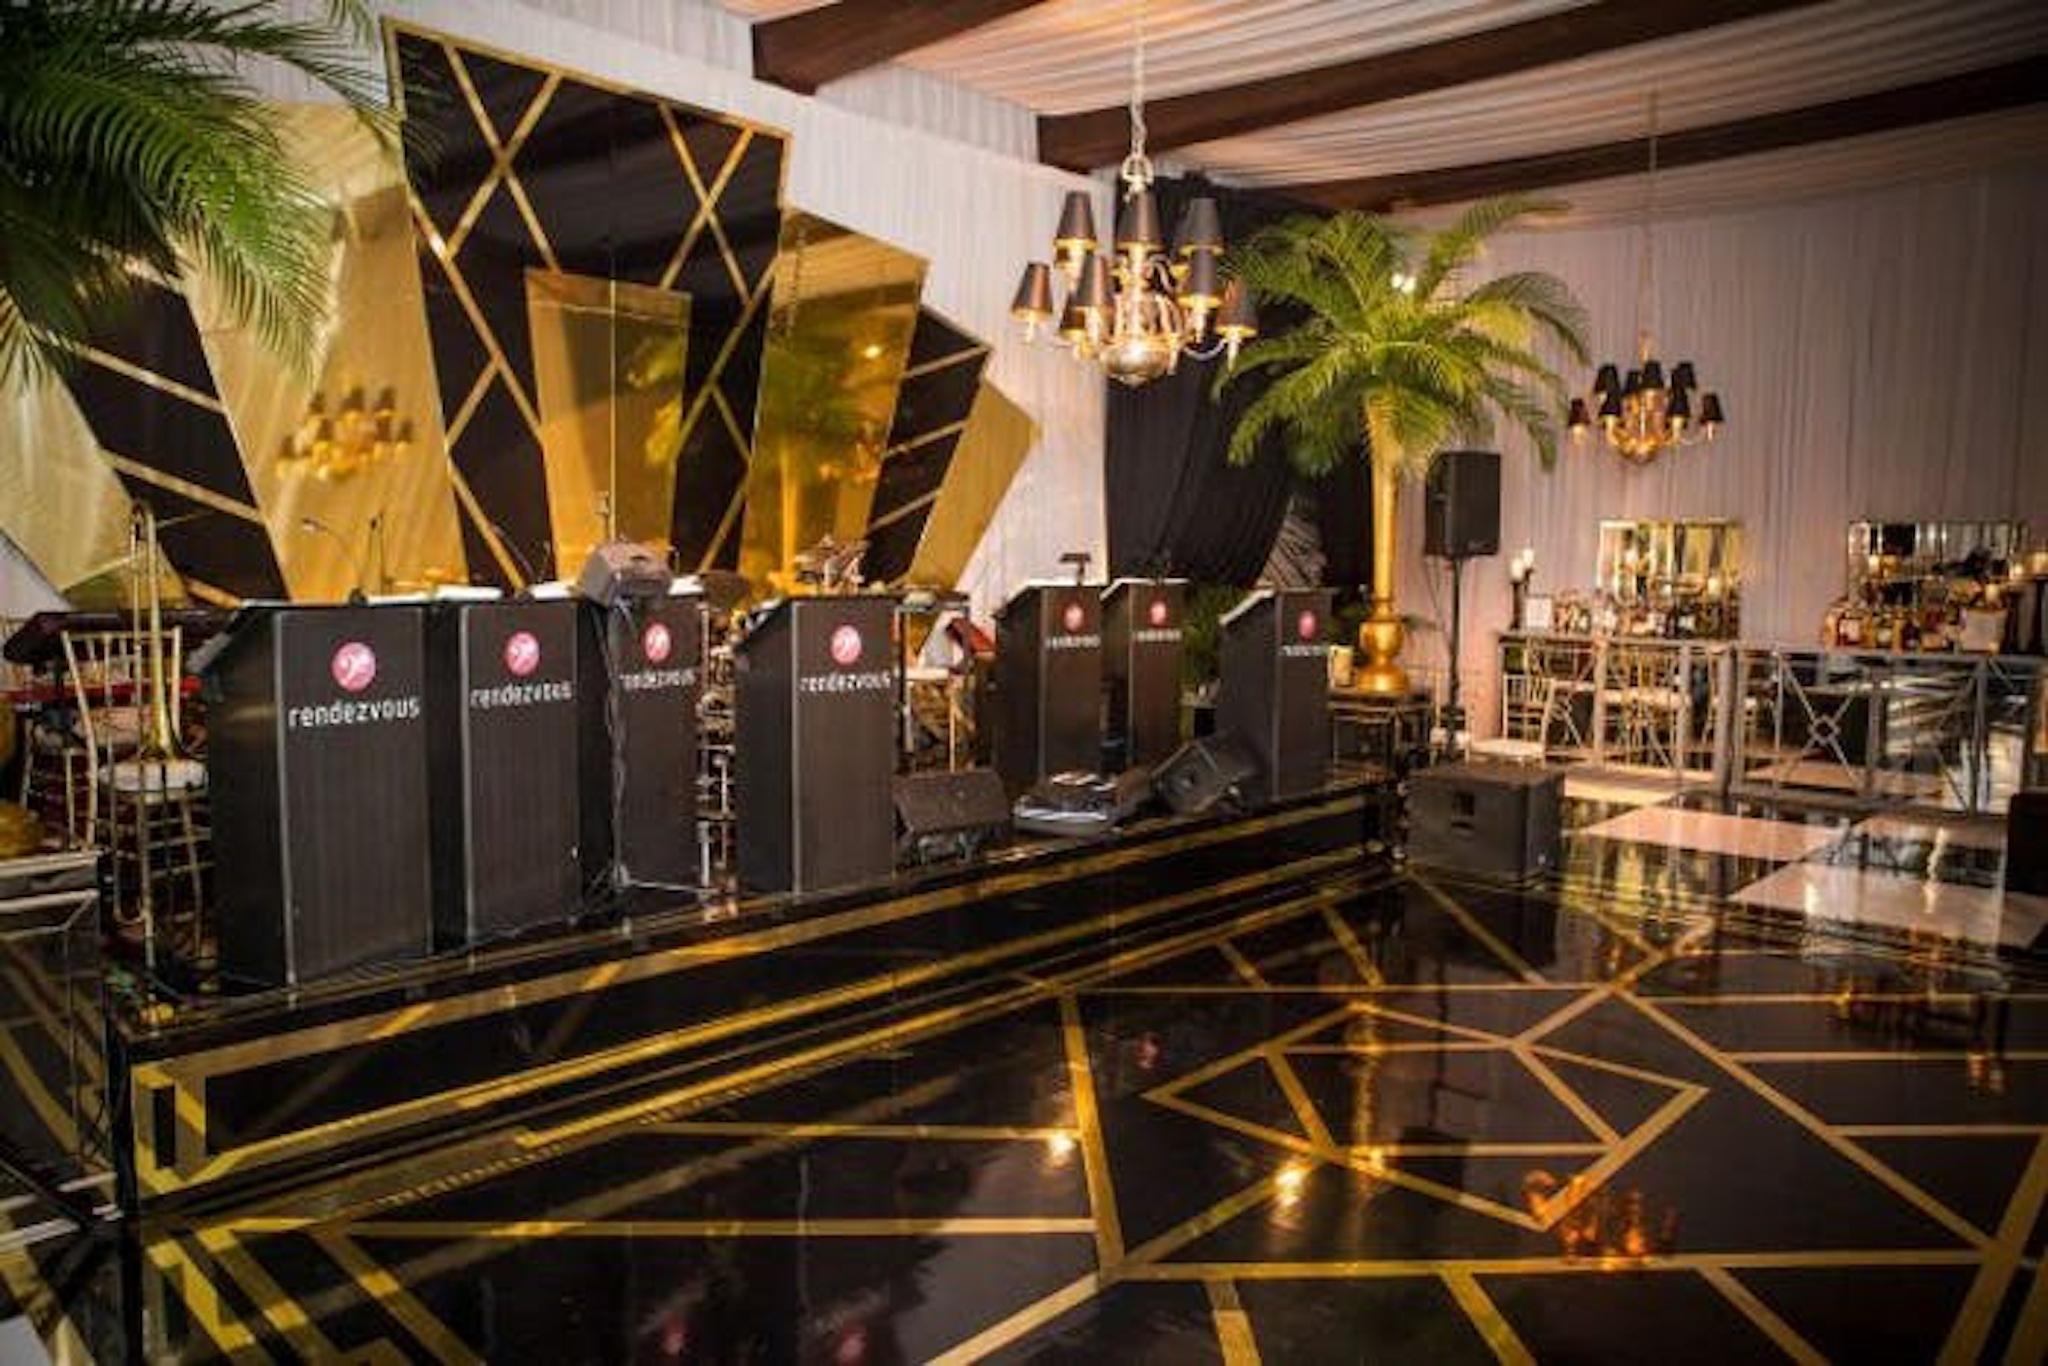 Gold and black decor